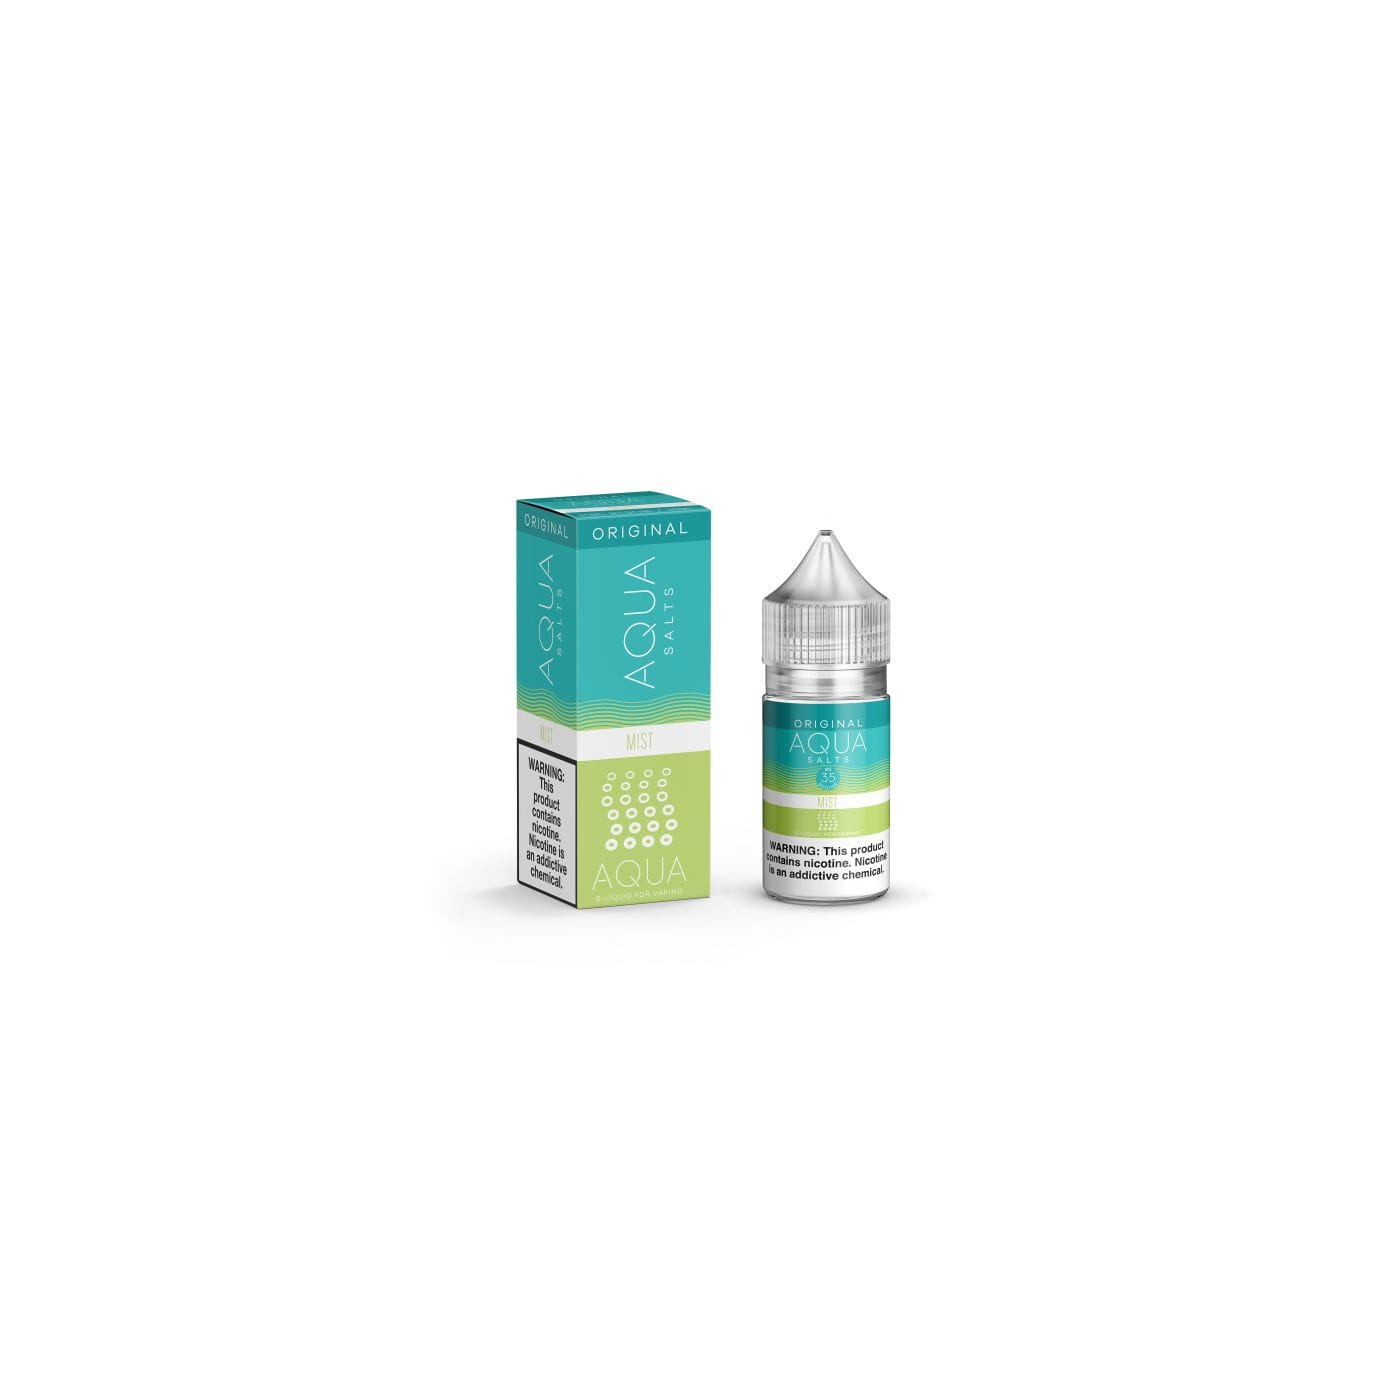 Aqua Salts Original Mist